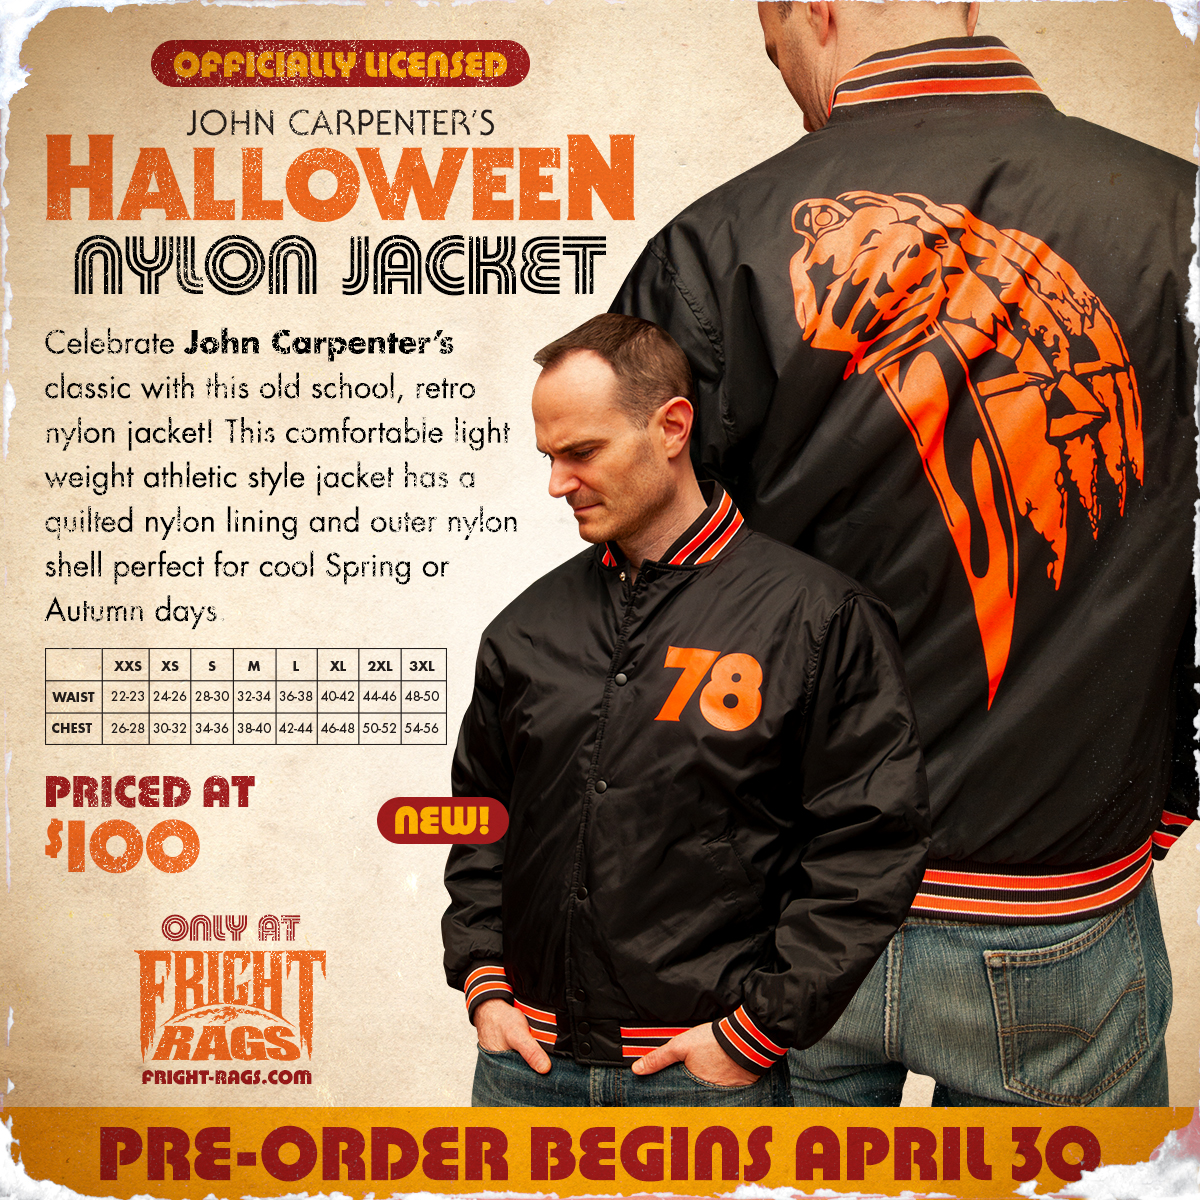 0419-HalloweenJacket-FrightRags.jpg